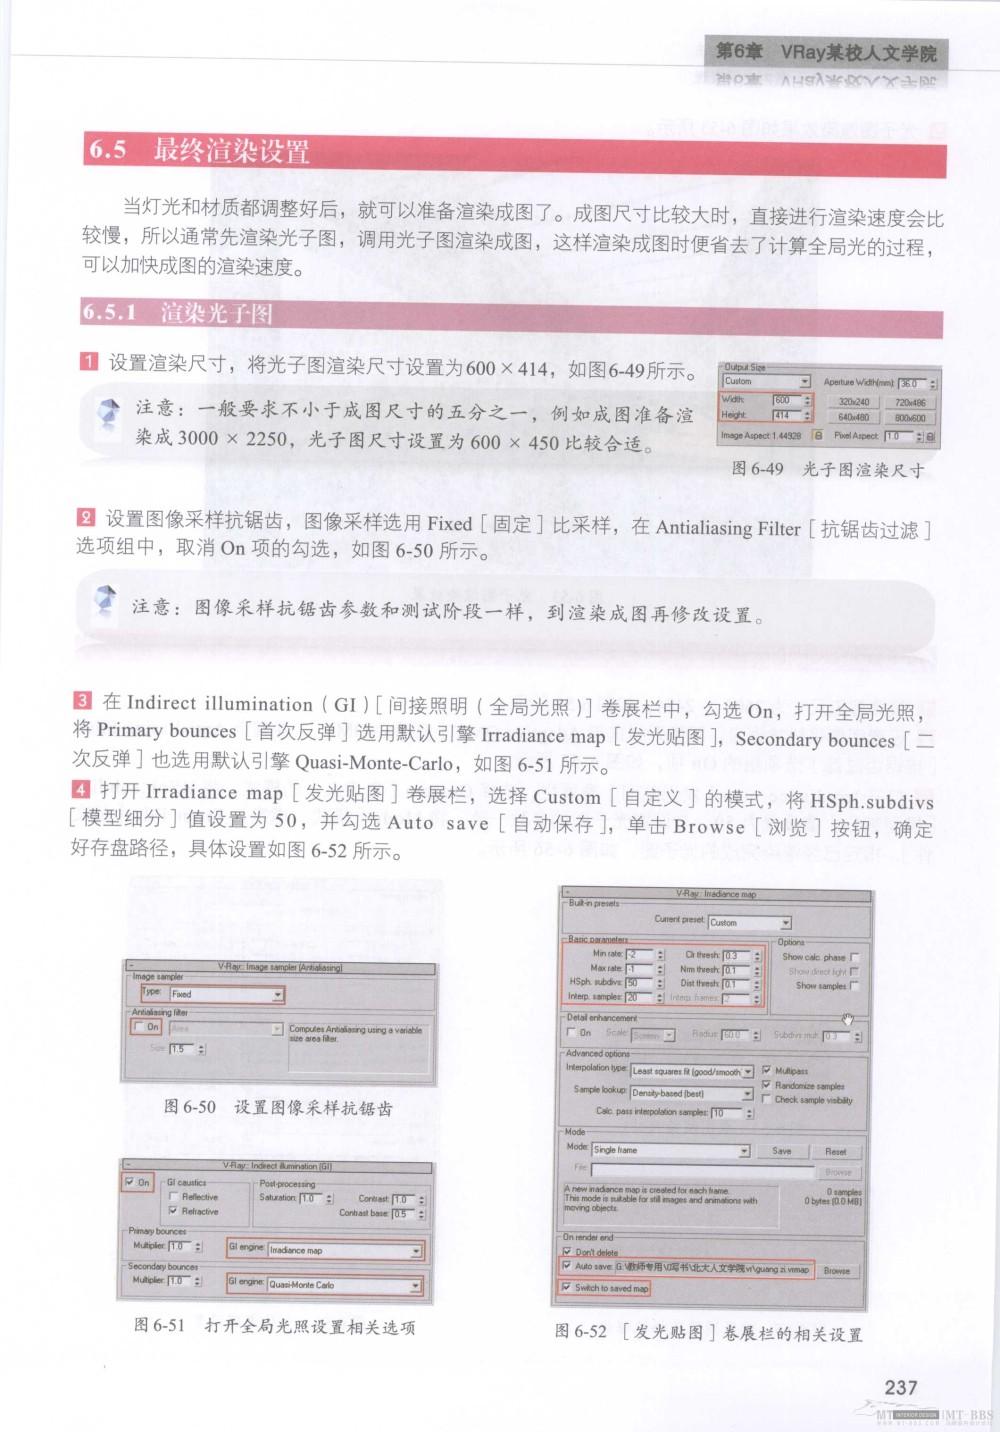 水晶石技法-3ds_Max&VRay室内空间表现_水晶石技法-3ds_Max&VRay室内空间表现_页面_243.jpg